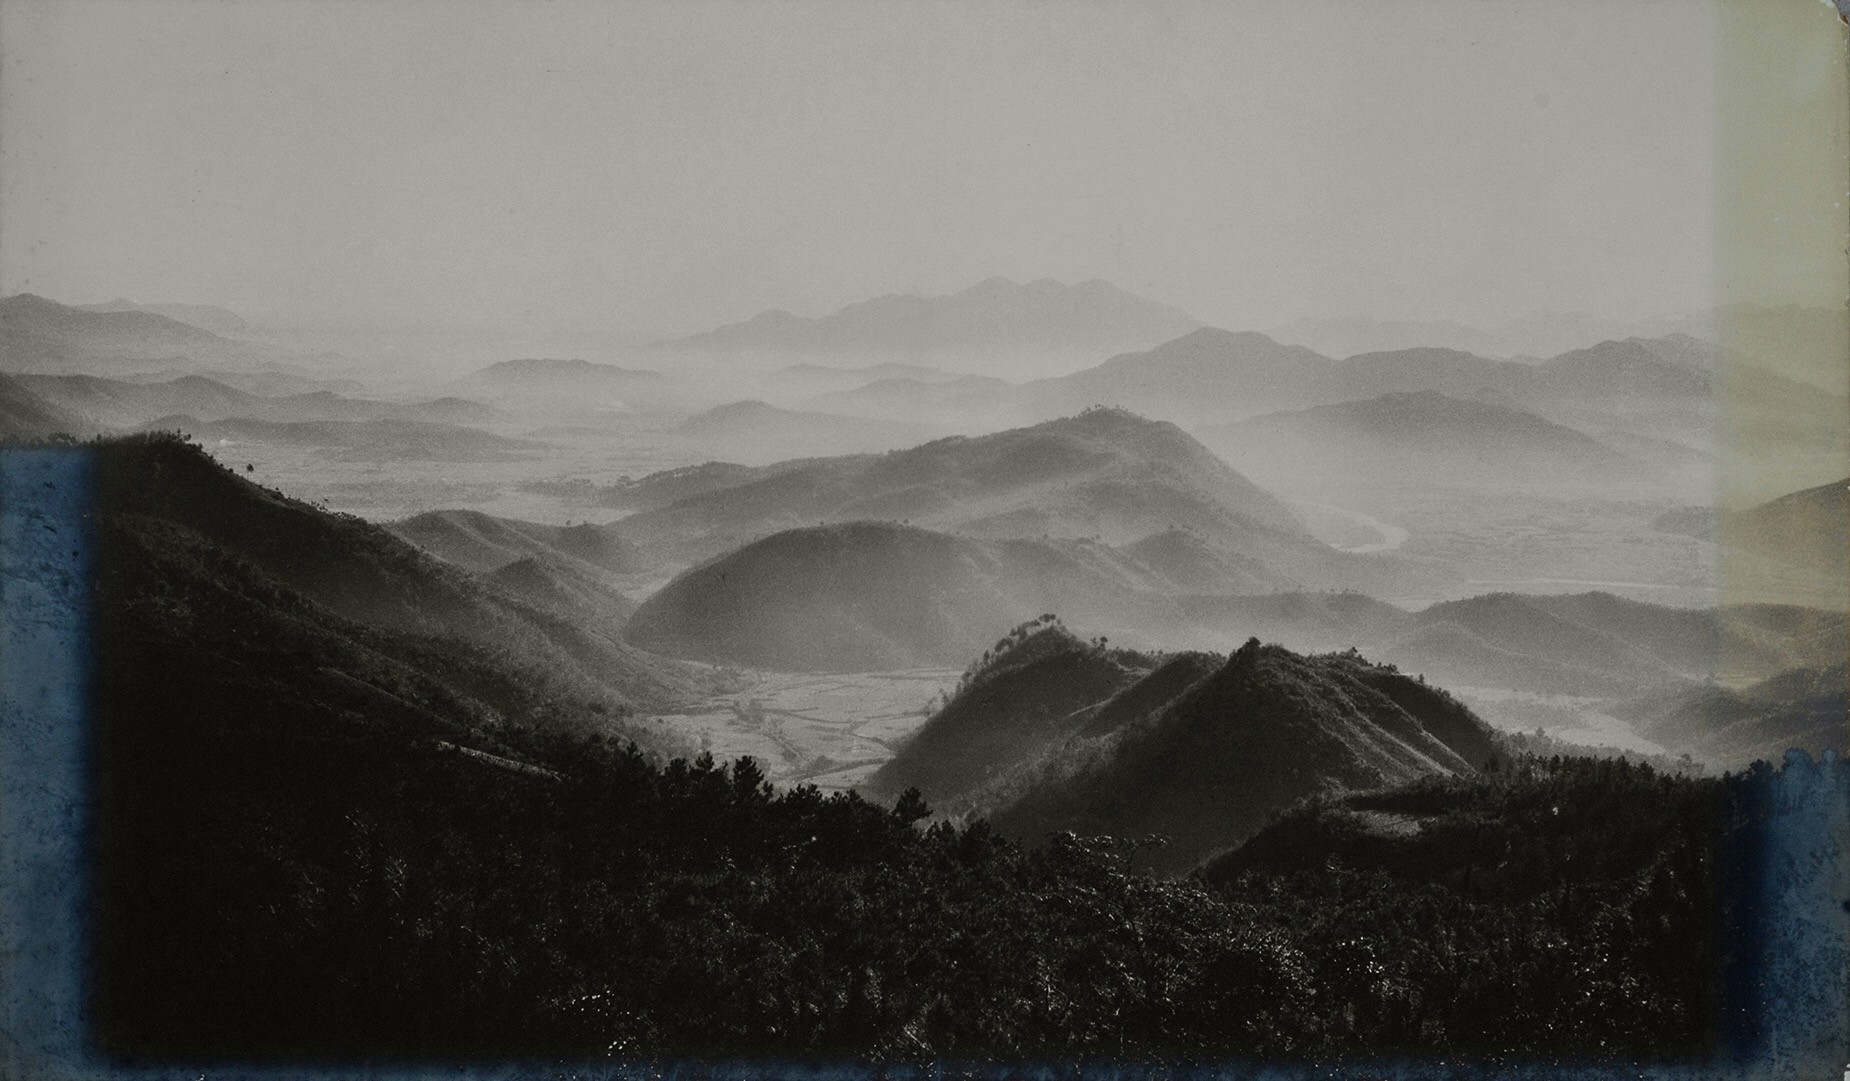 xue-zijiang-china-1950s-photography-of-china-6.jpeg